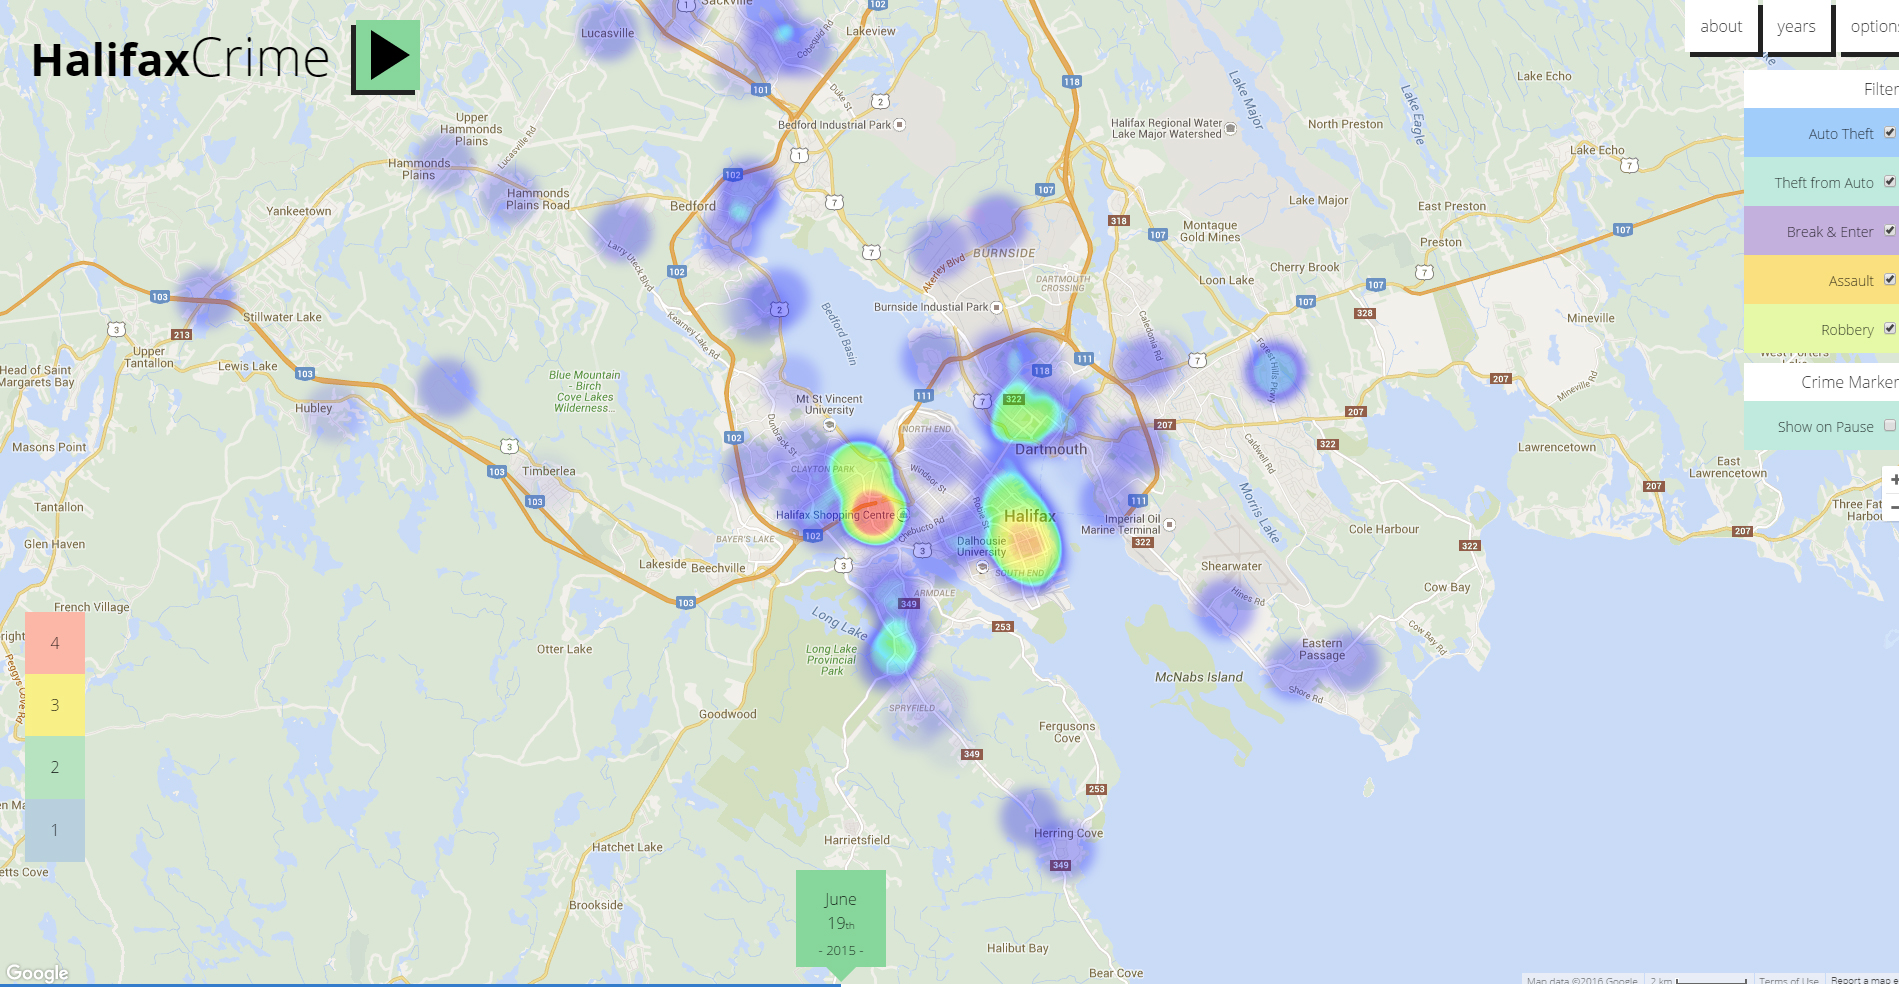 Halifax Crime